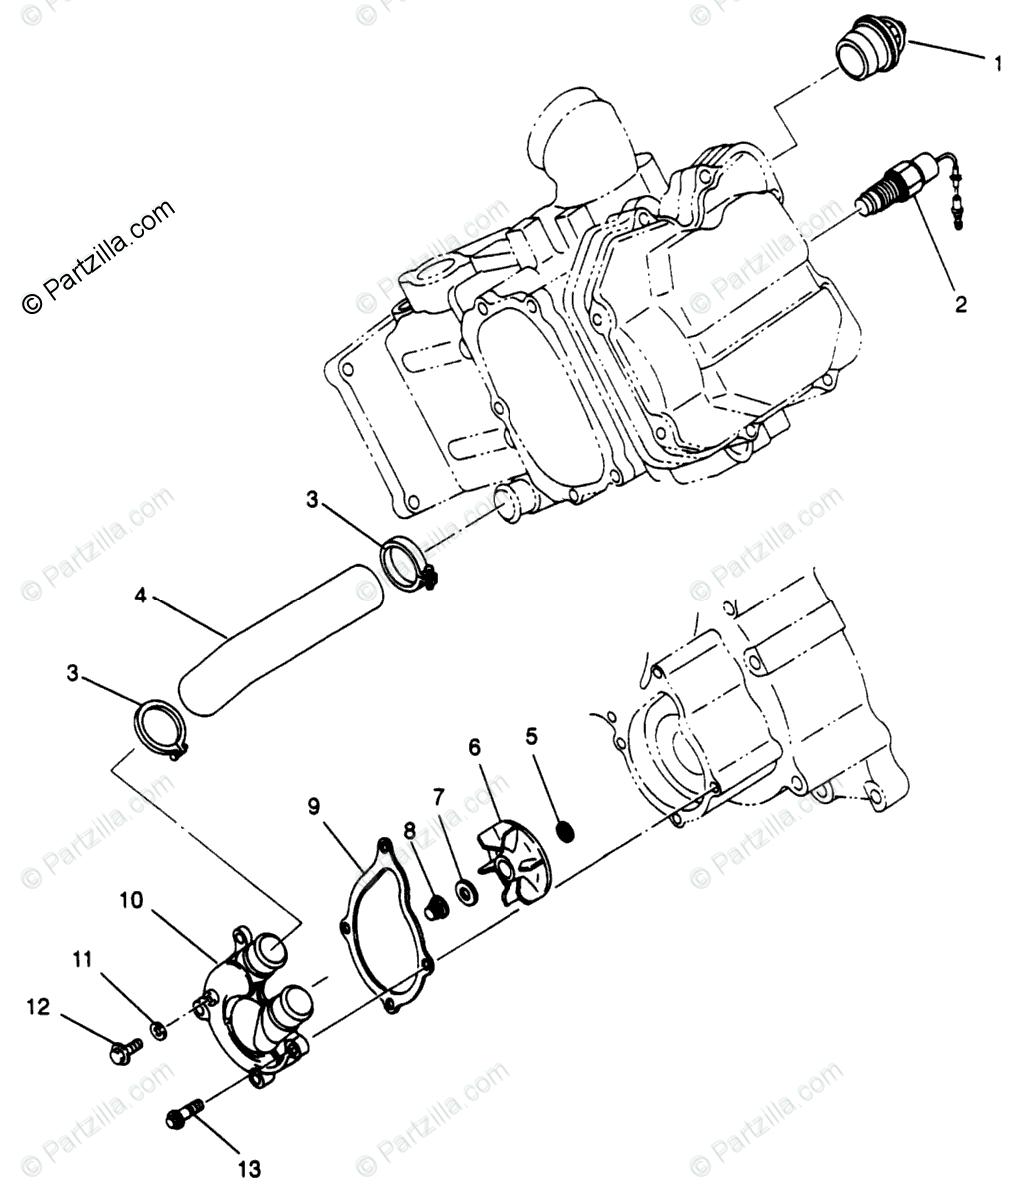 Br 2050  1995 Polaris 300 4x4 Wiring Diagram Free